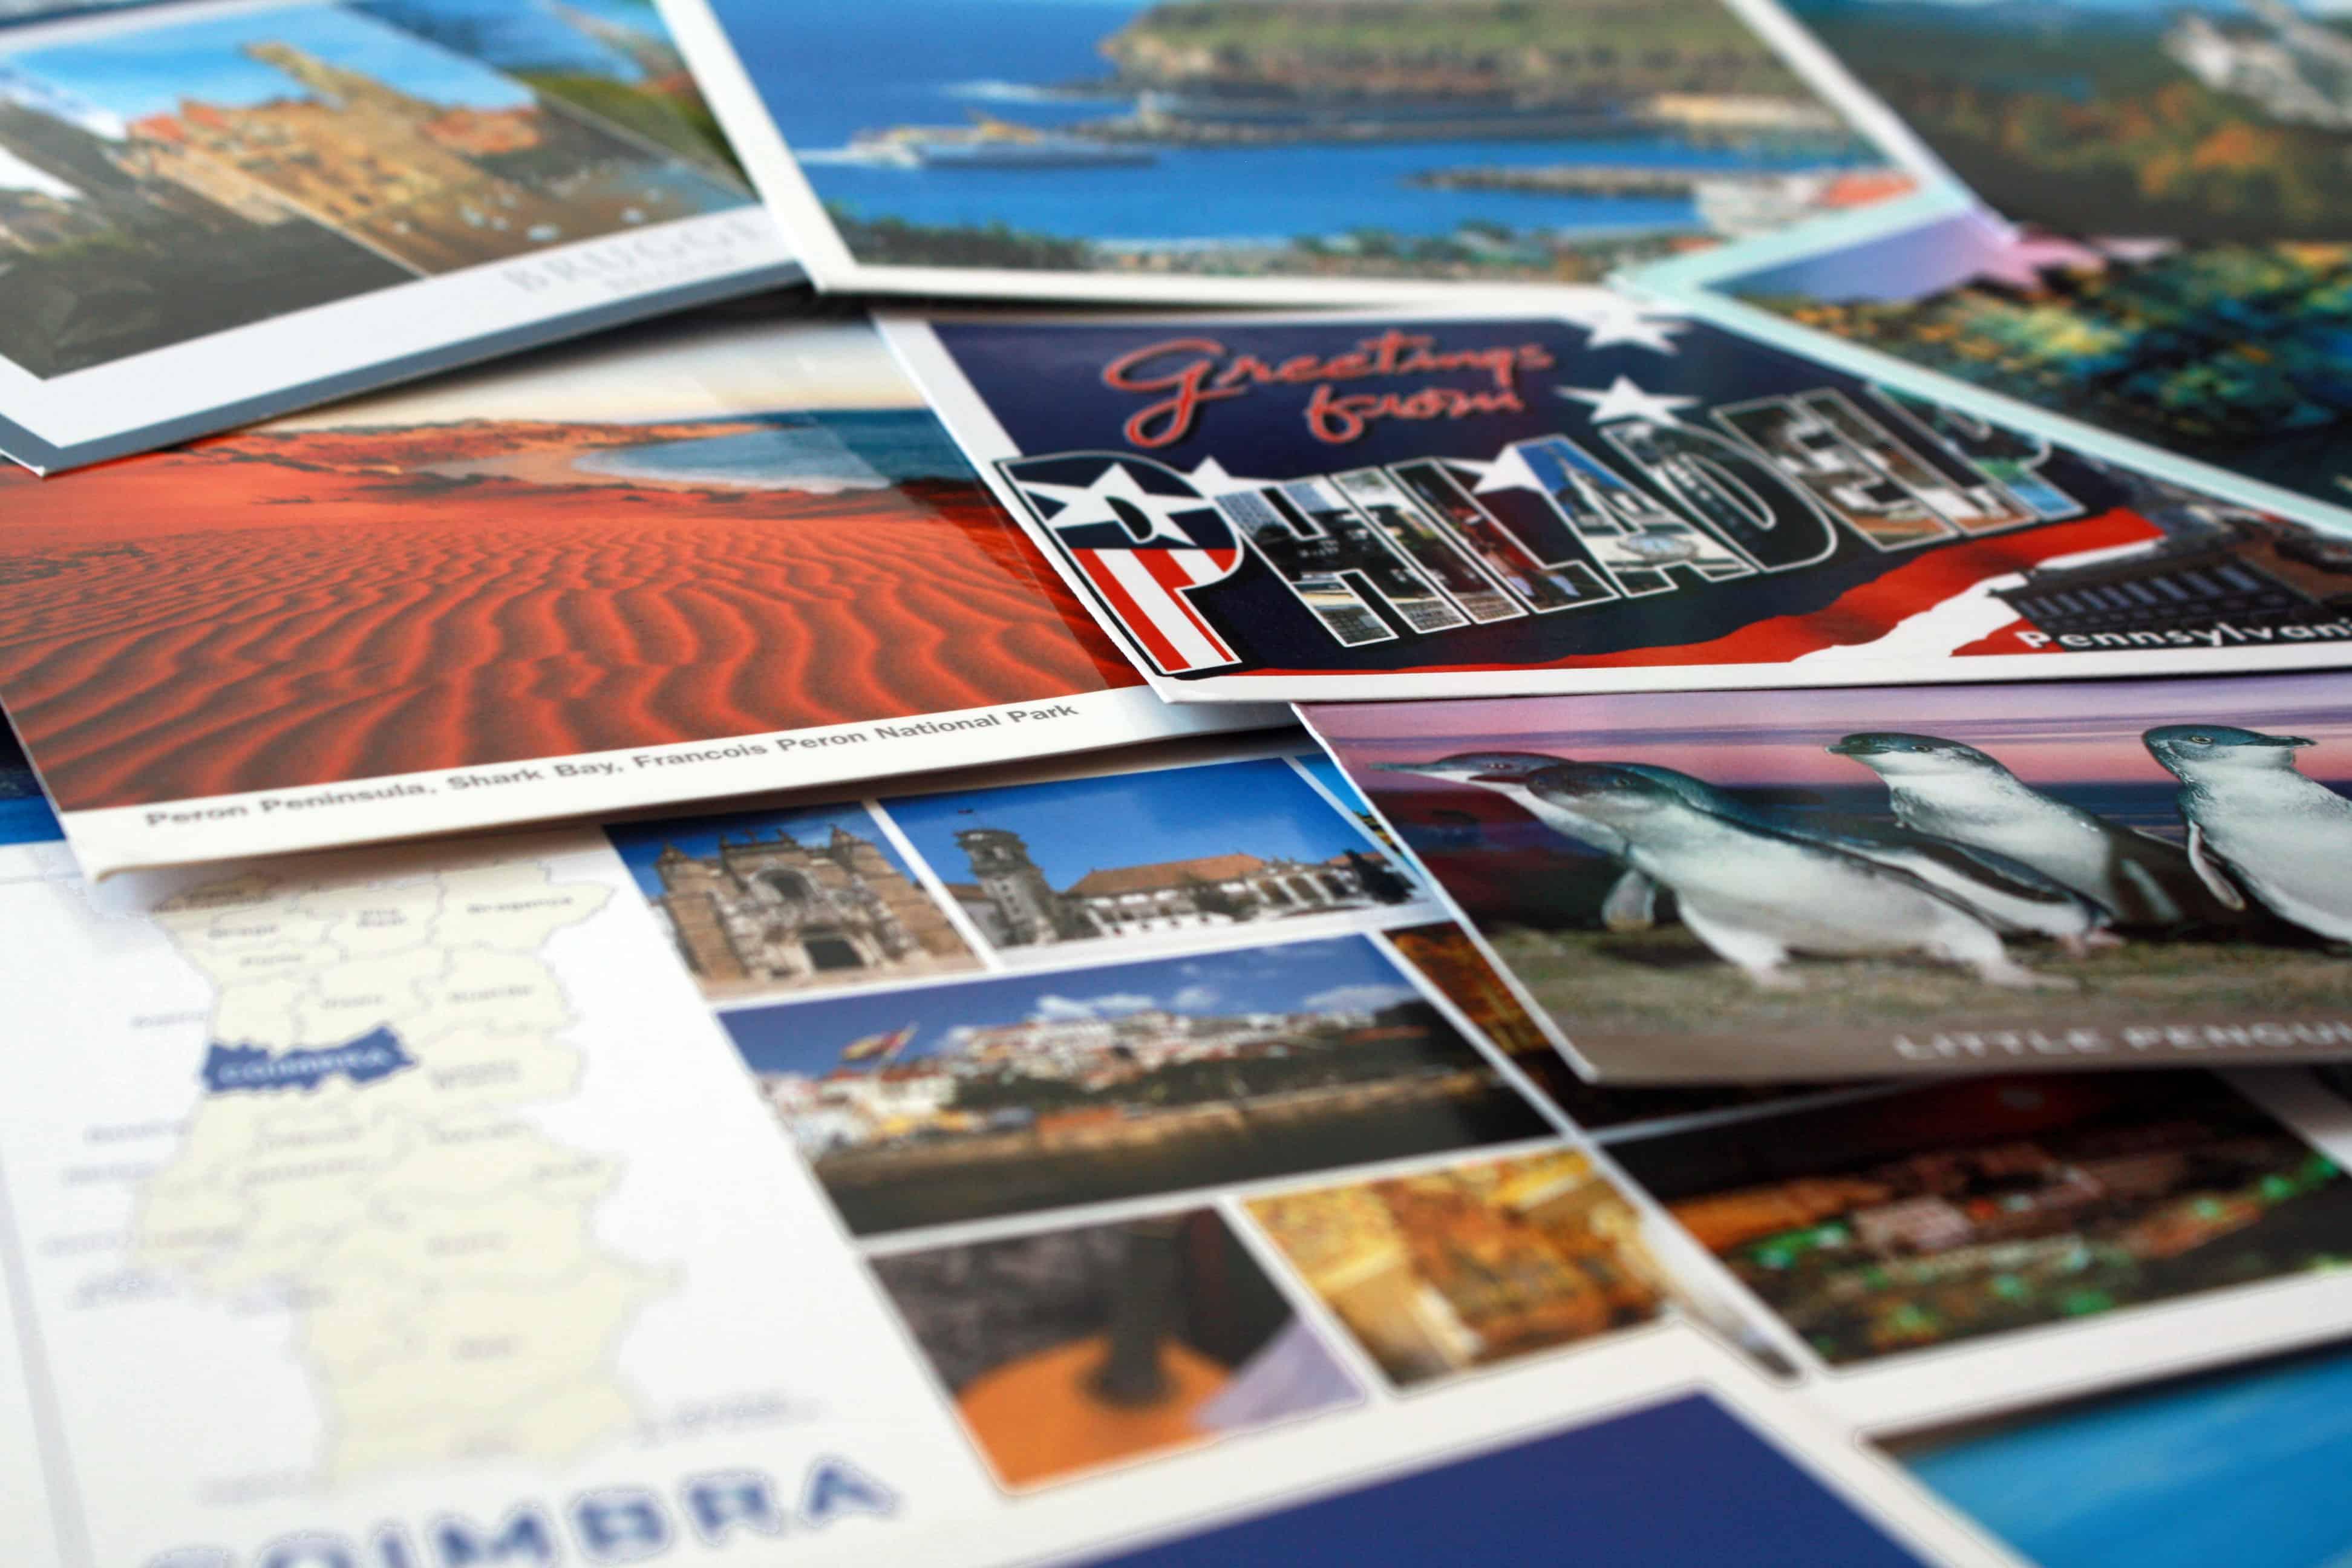 Philadelphia postcard and more